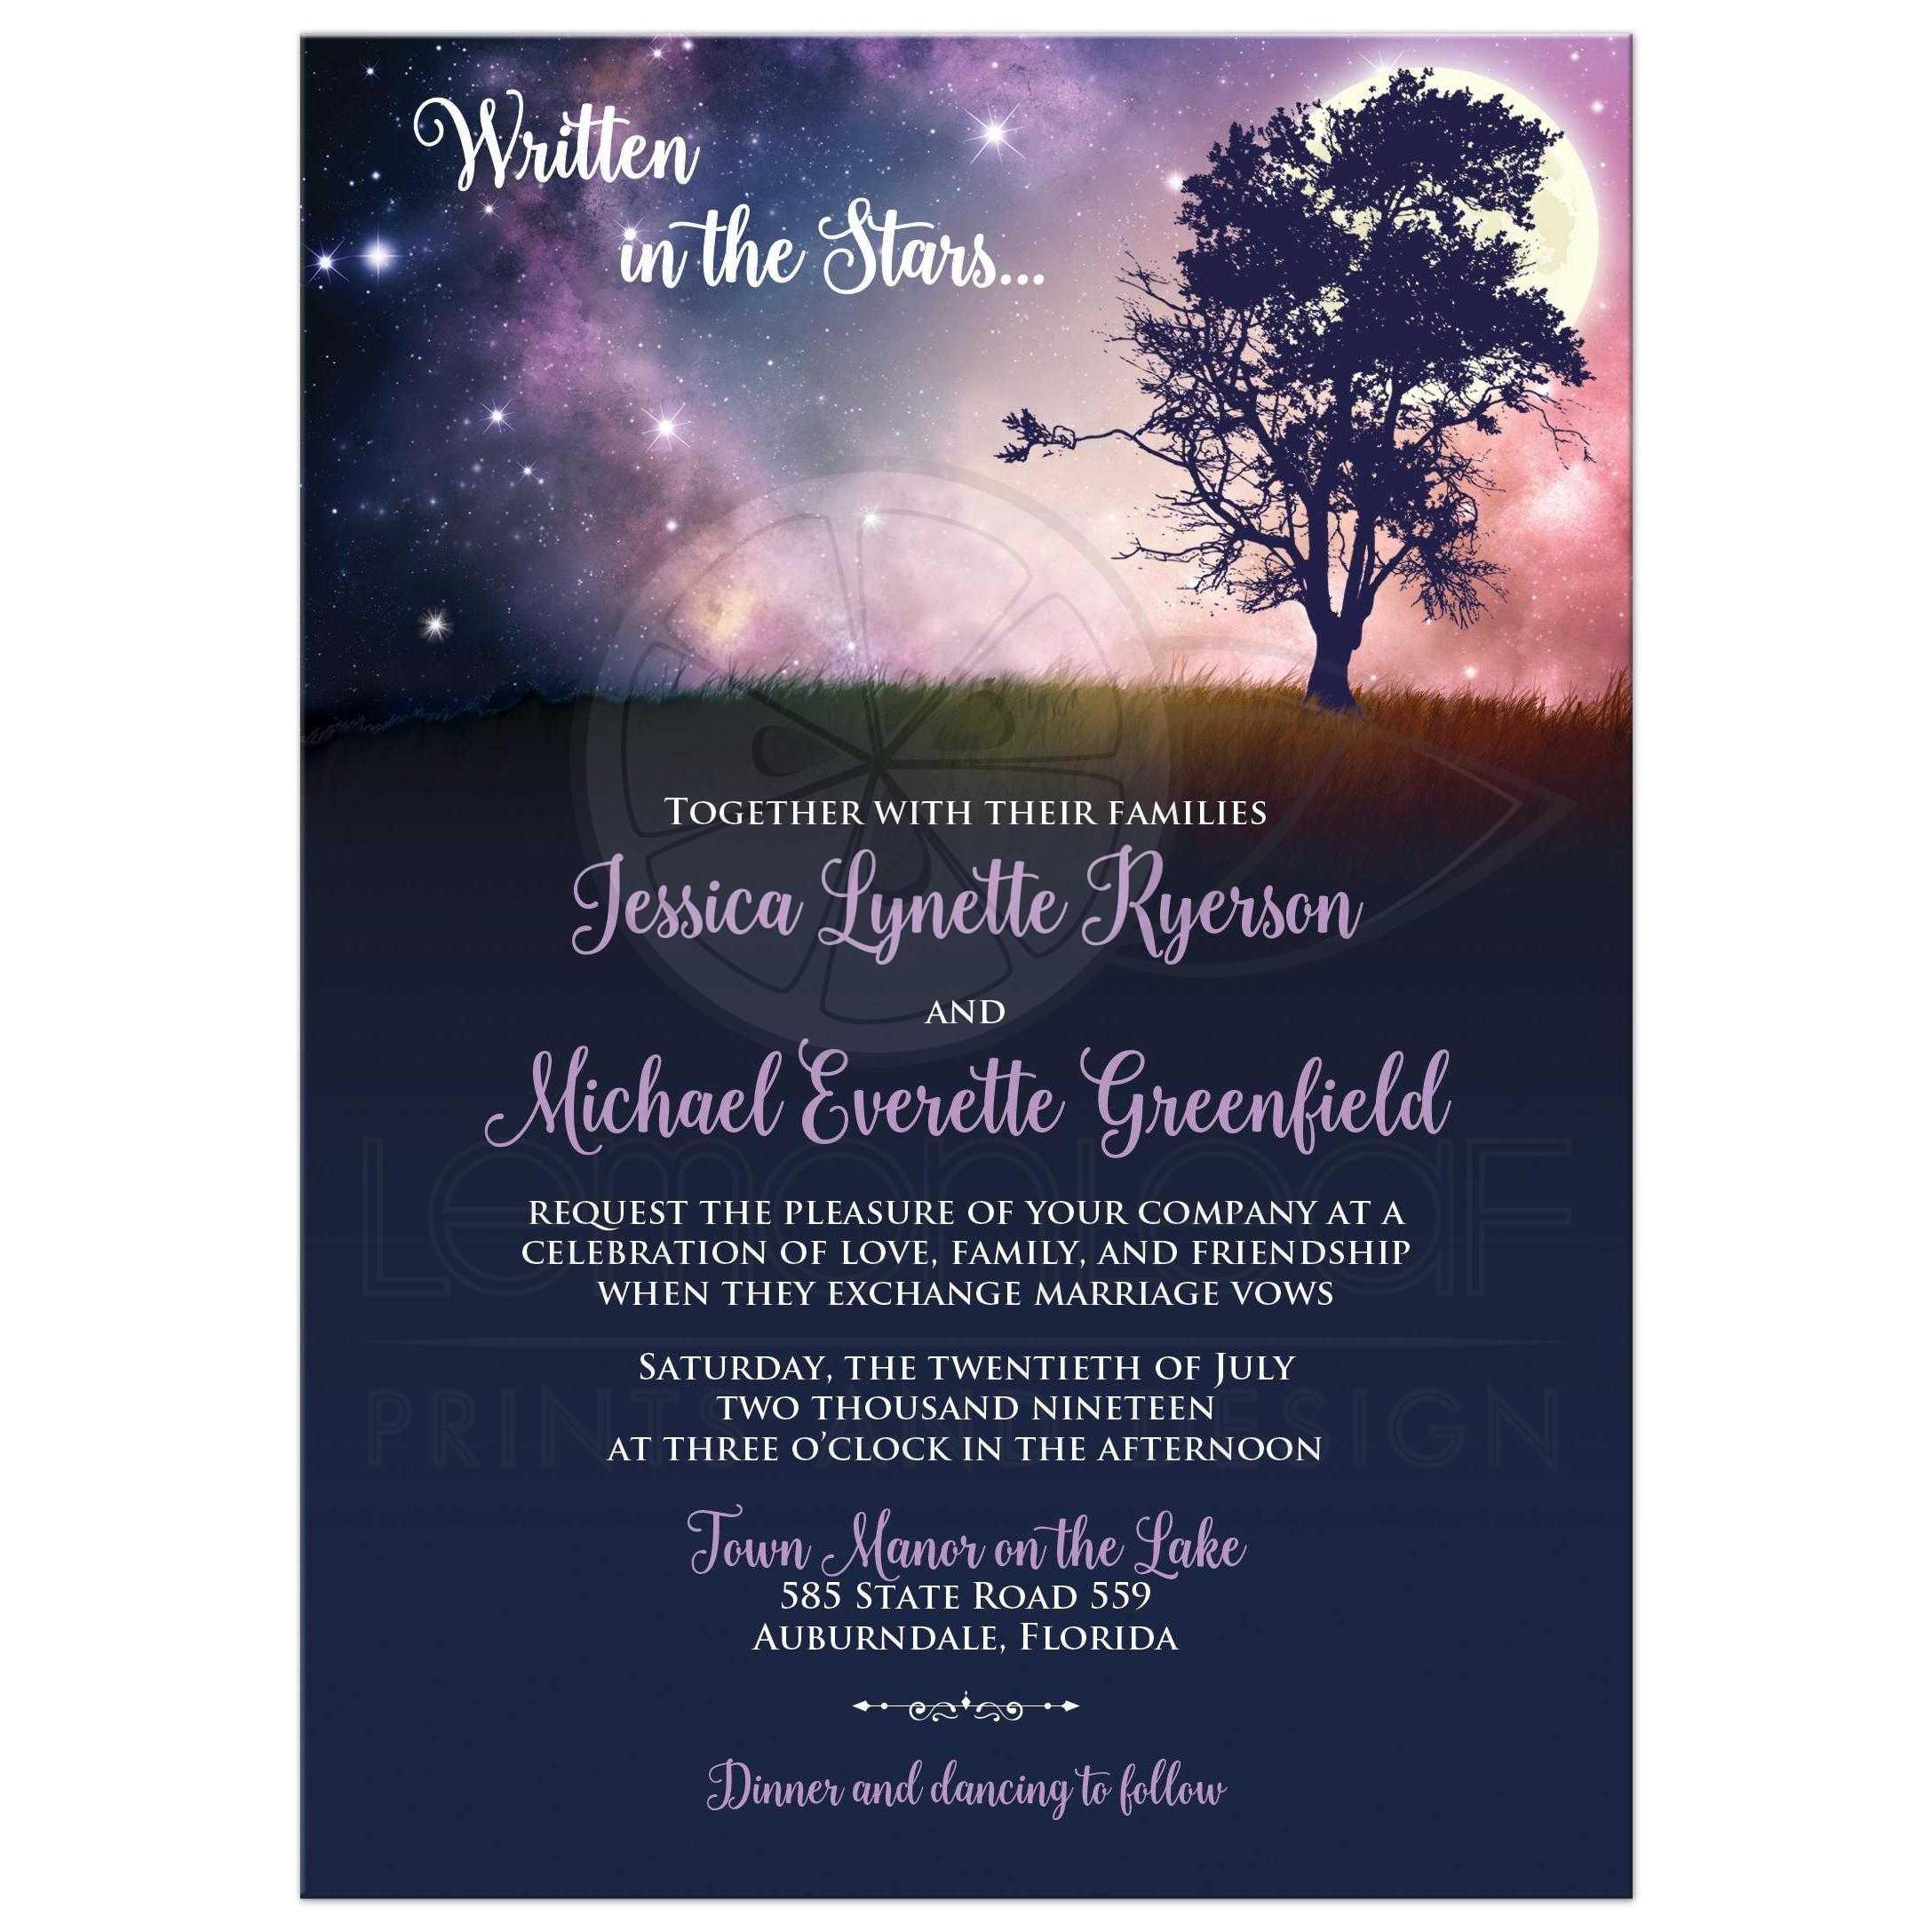 Written In The Stars Wedding Invitation With Night Sky Tree: Blue Moon Wedding Invitations At Websimilar.org